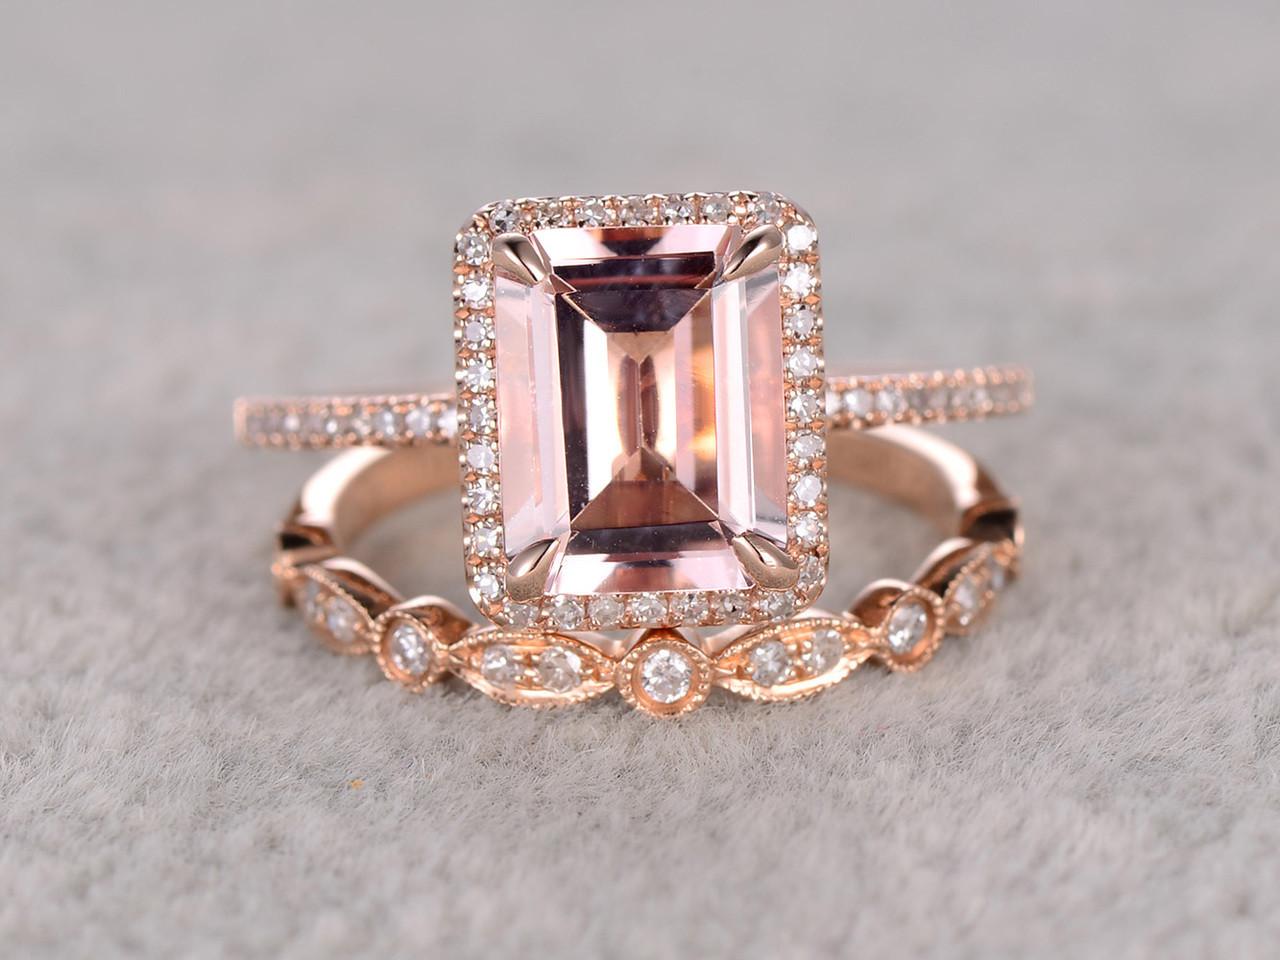 25 to 3 Carat Emerald Cut Morganite Engagement Ring Set Diamond